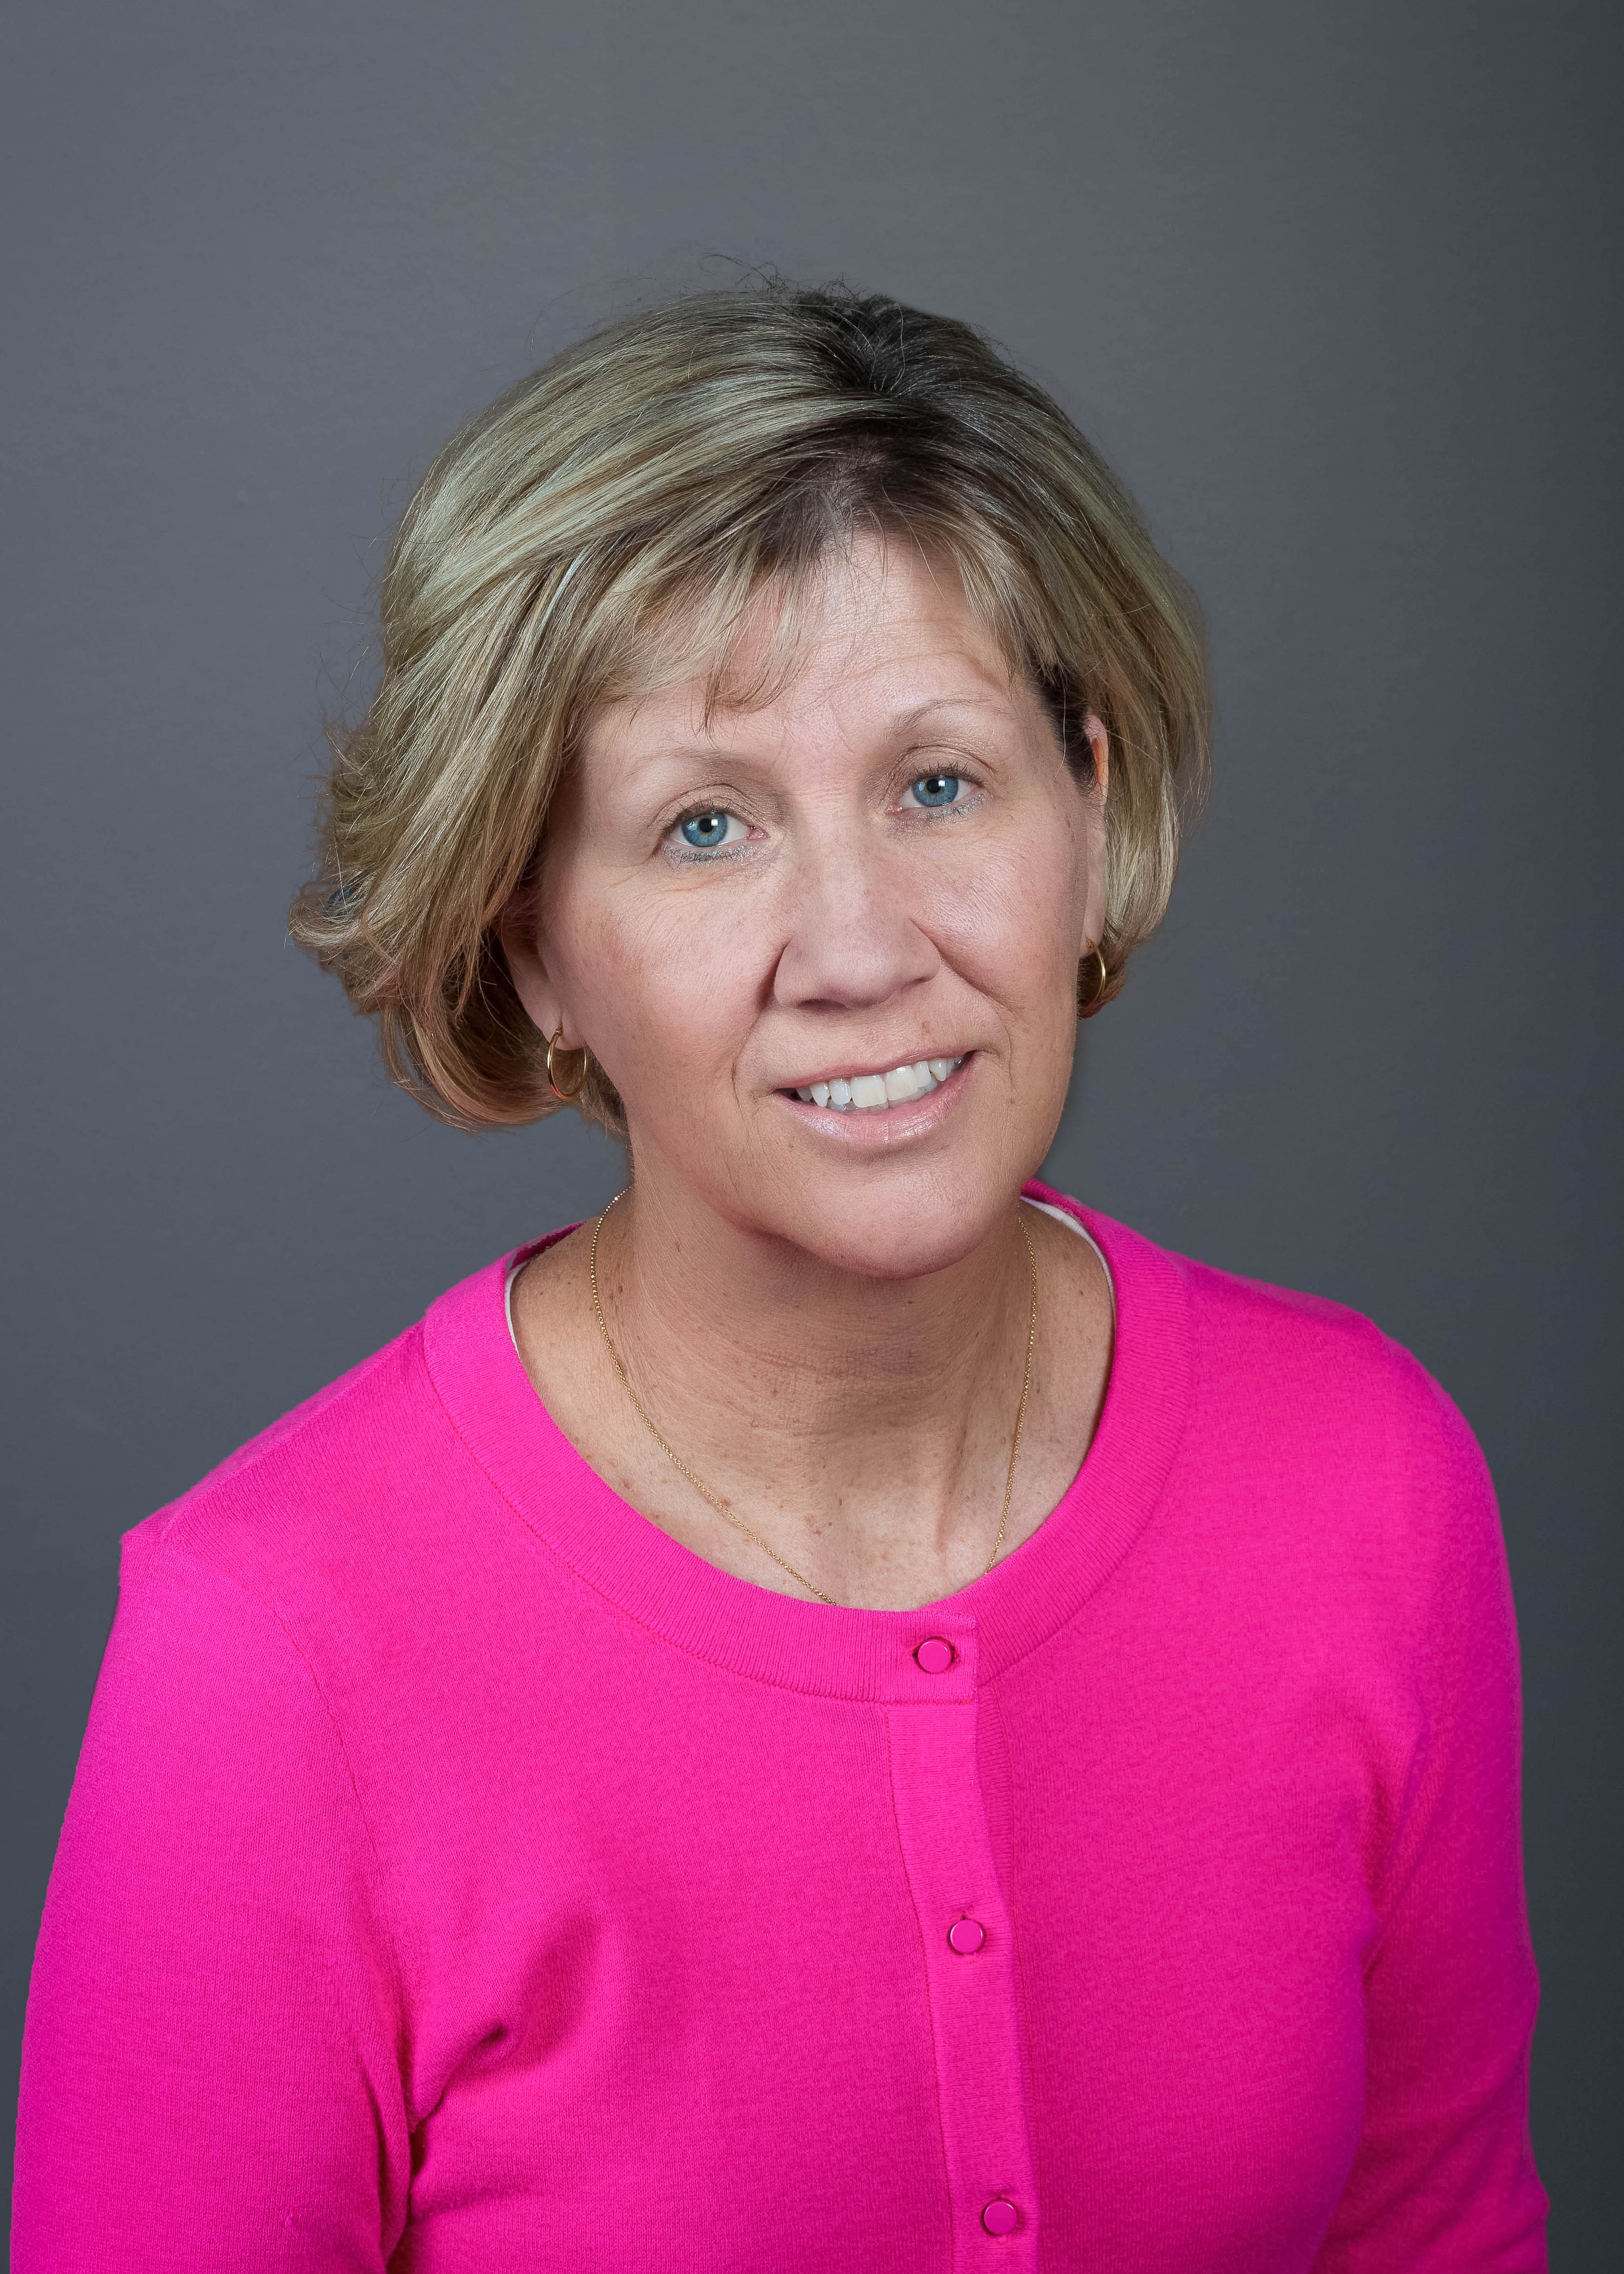 Lynne Chism